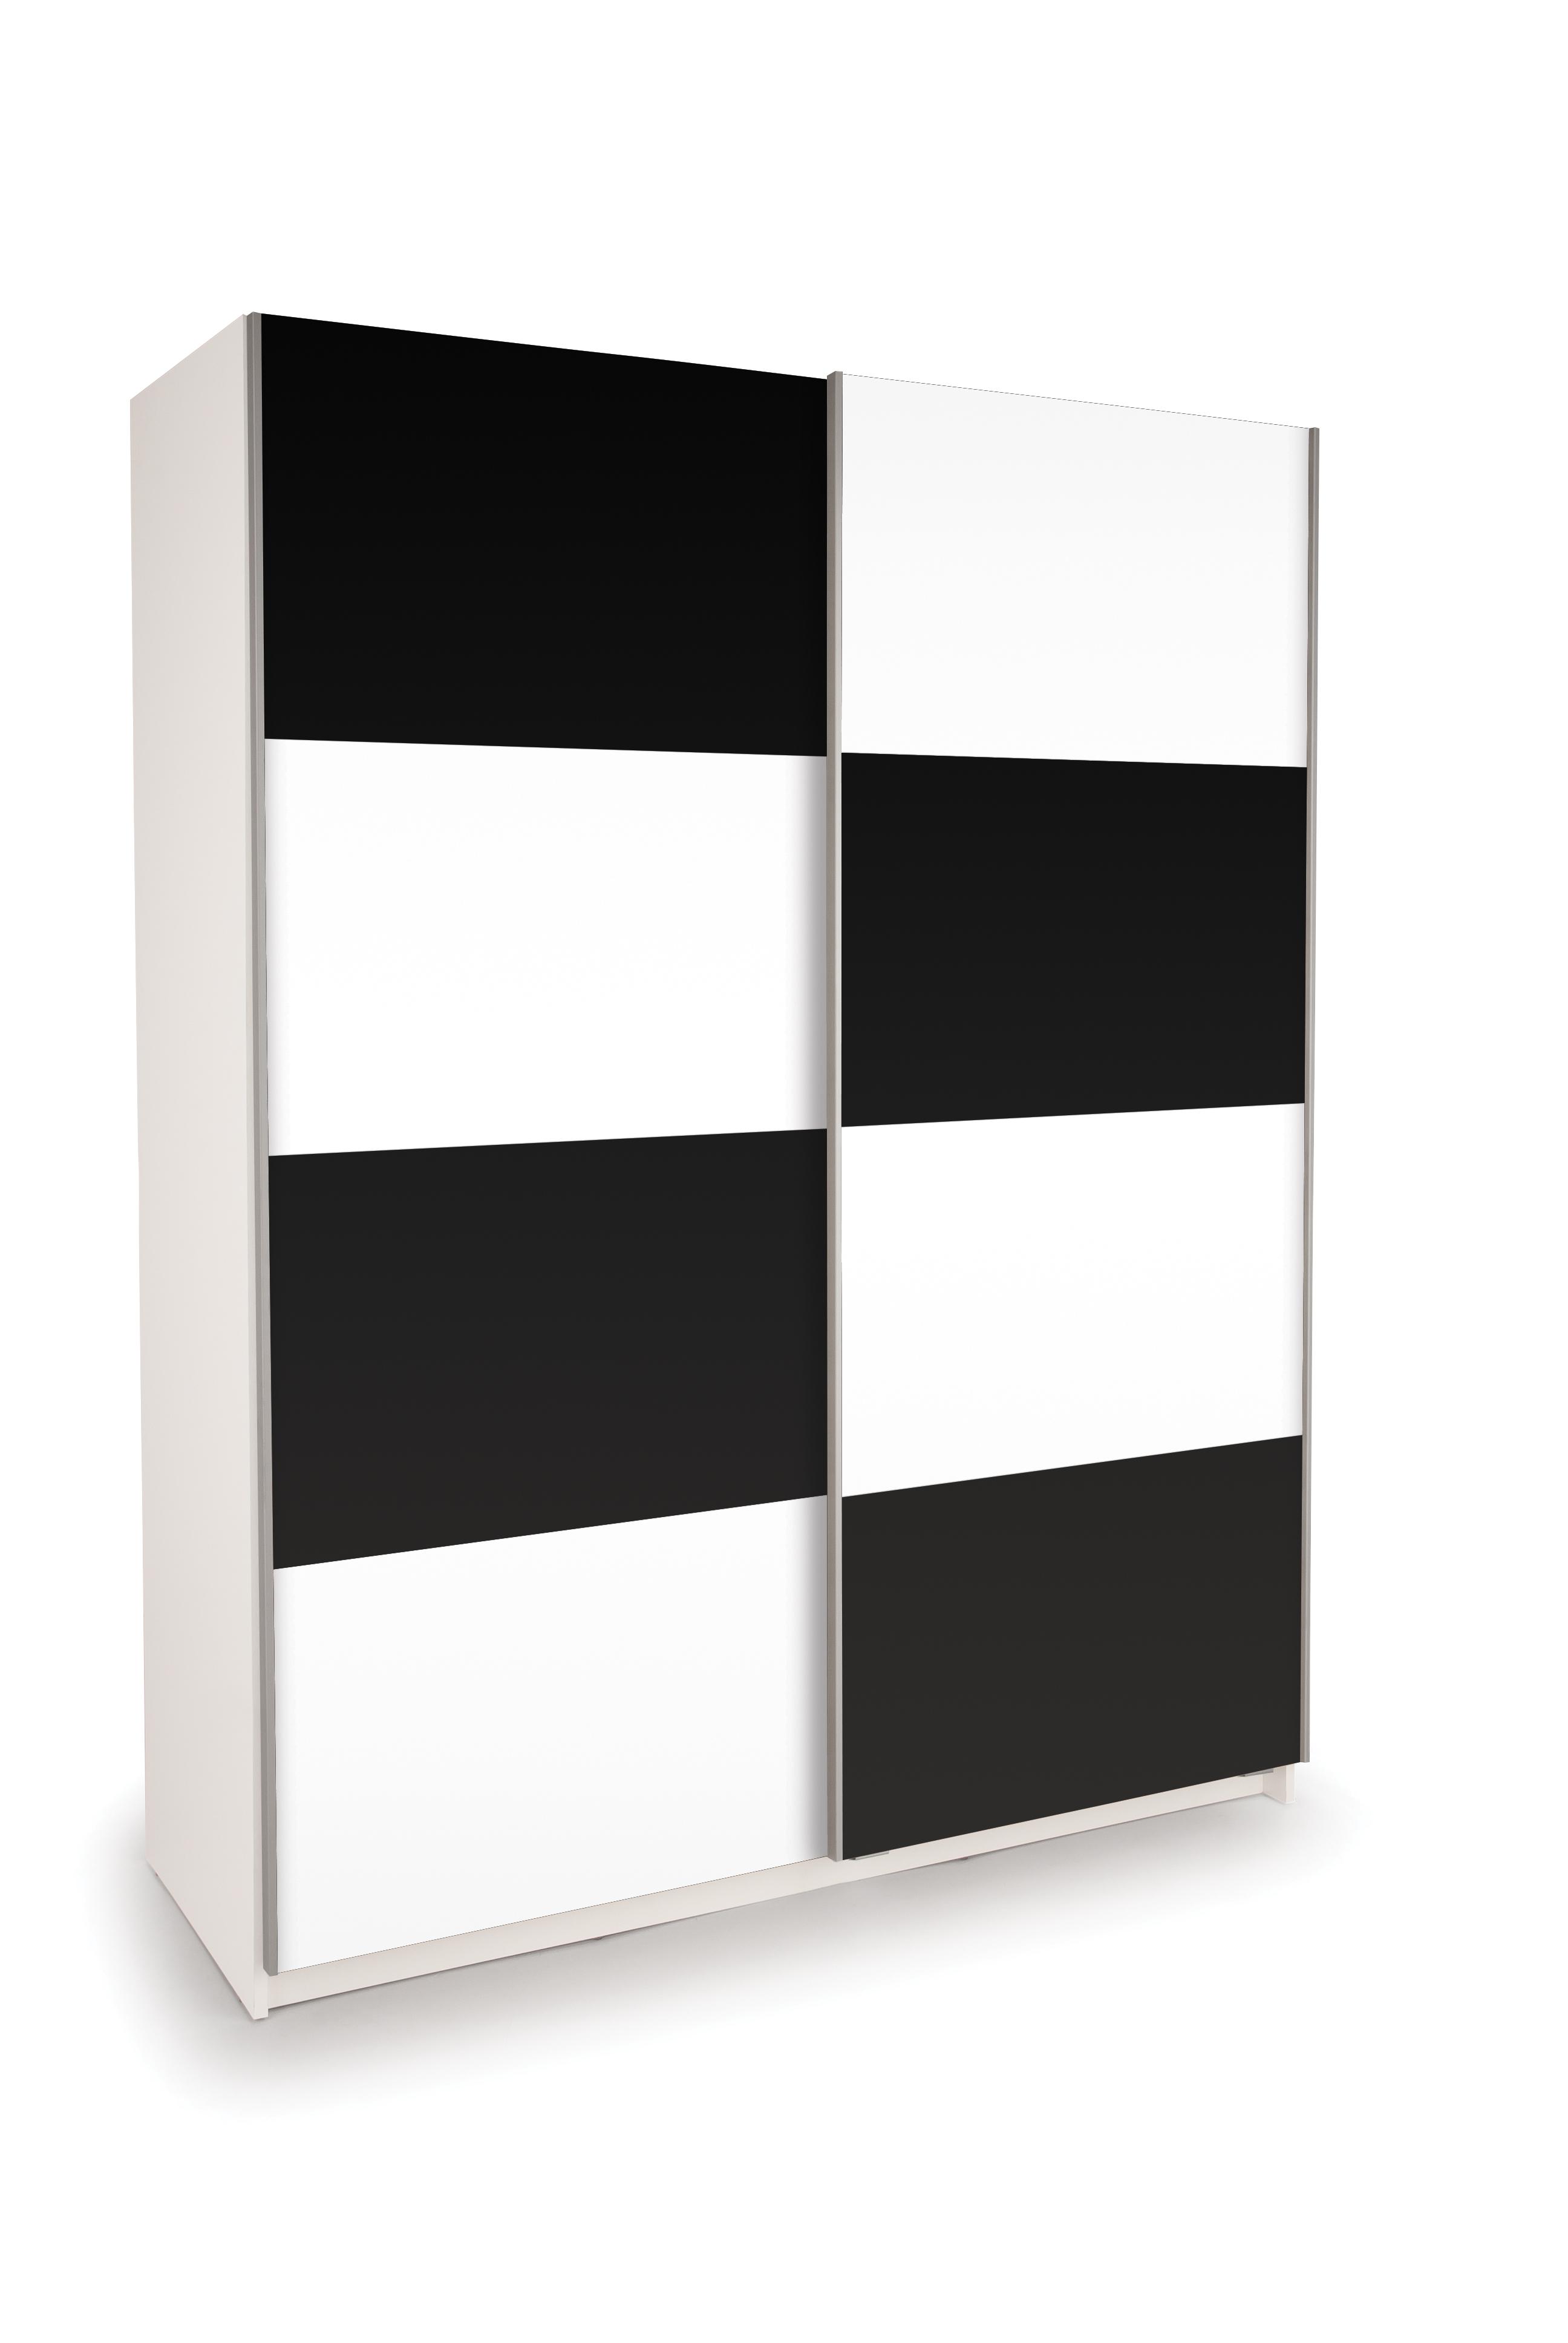 Dallas White Sliding Door Wardrobe High Gloss Black High Gloss White